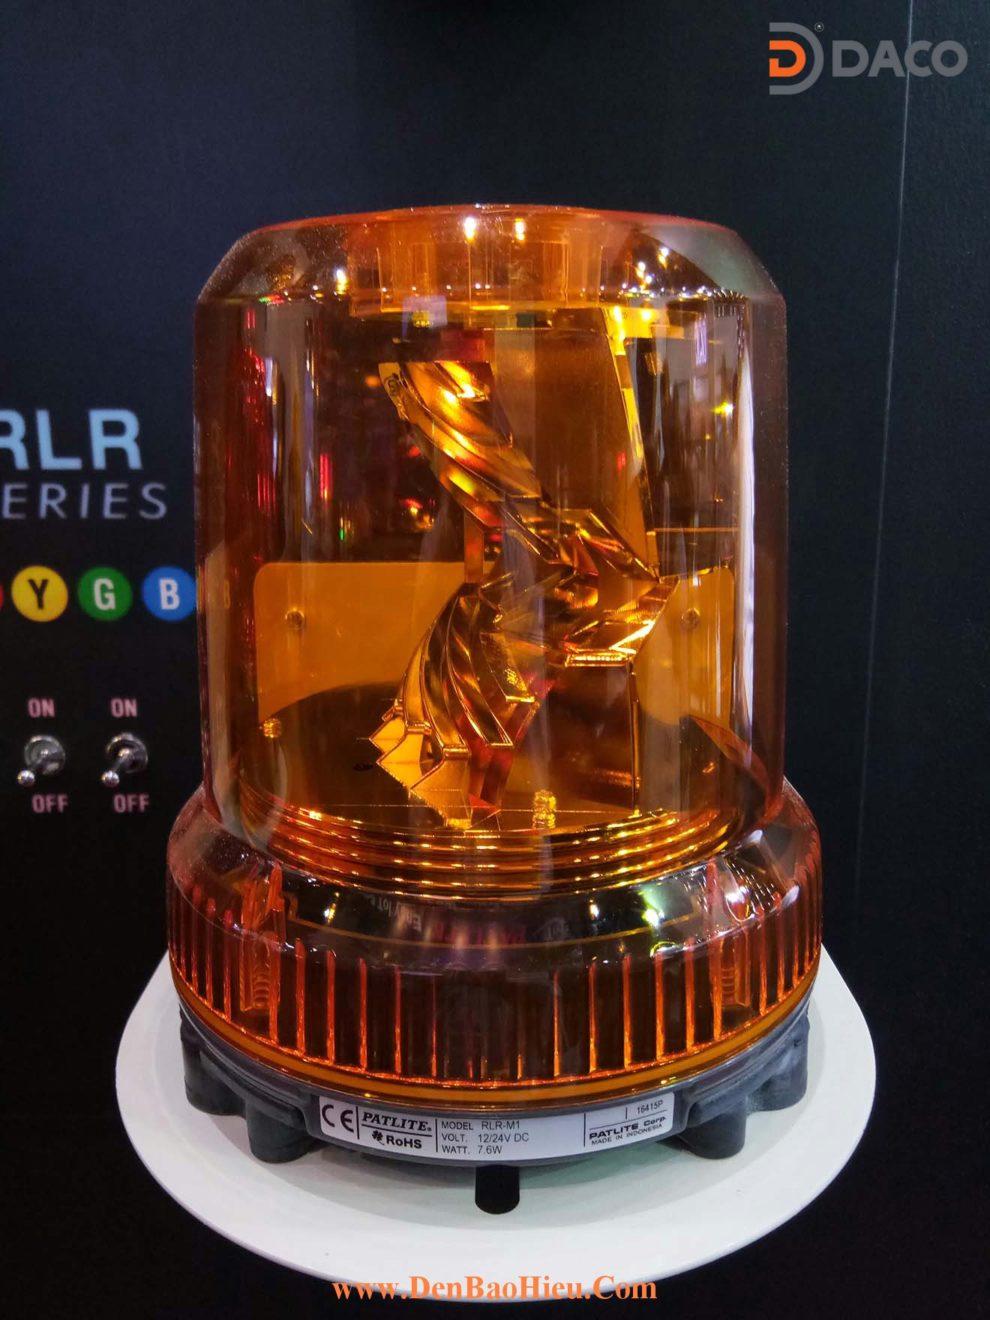 Den quay bong LED cho xe cong trinh RLR